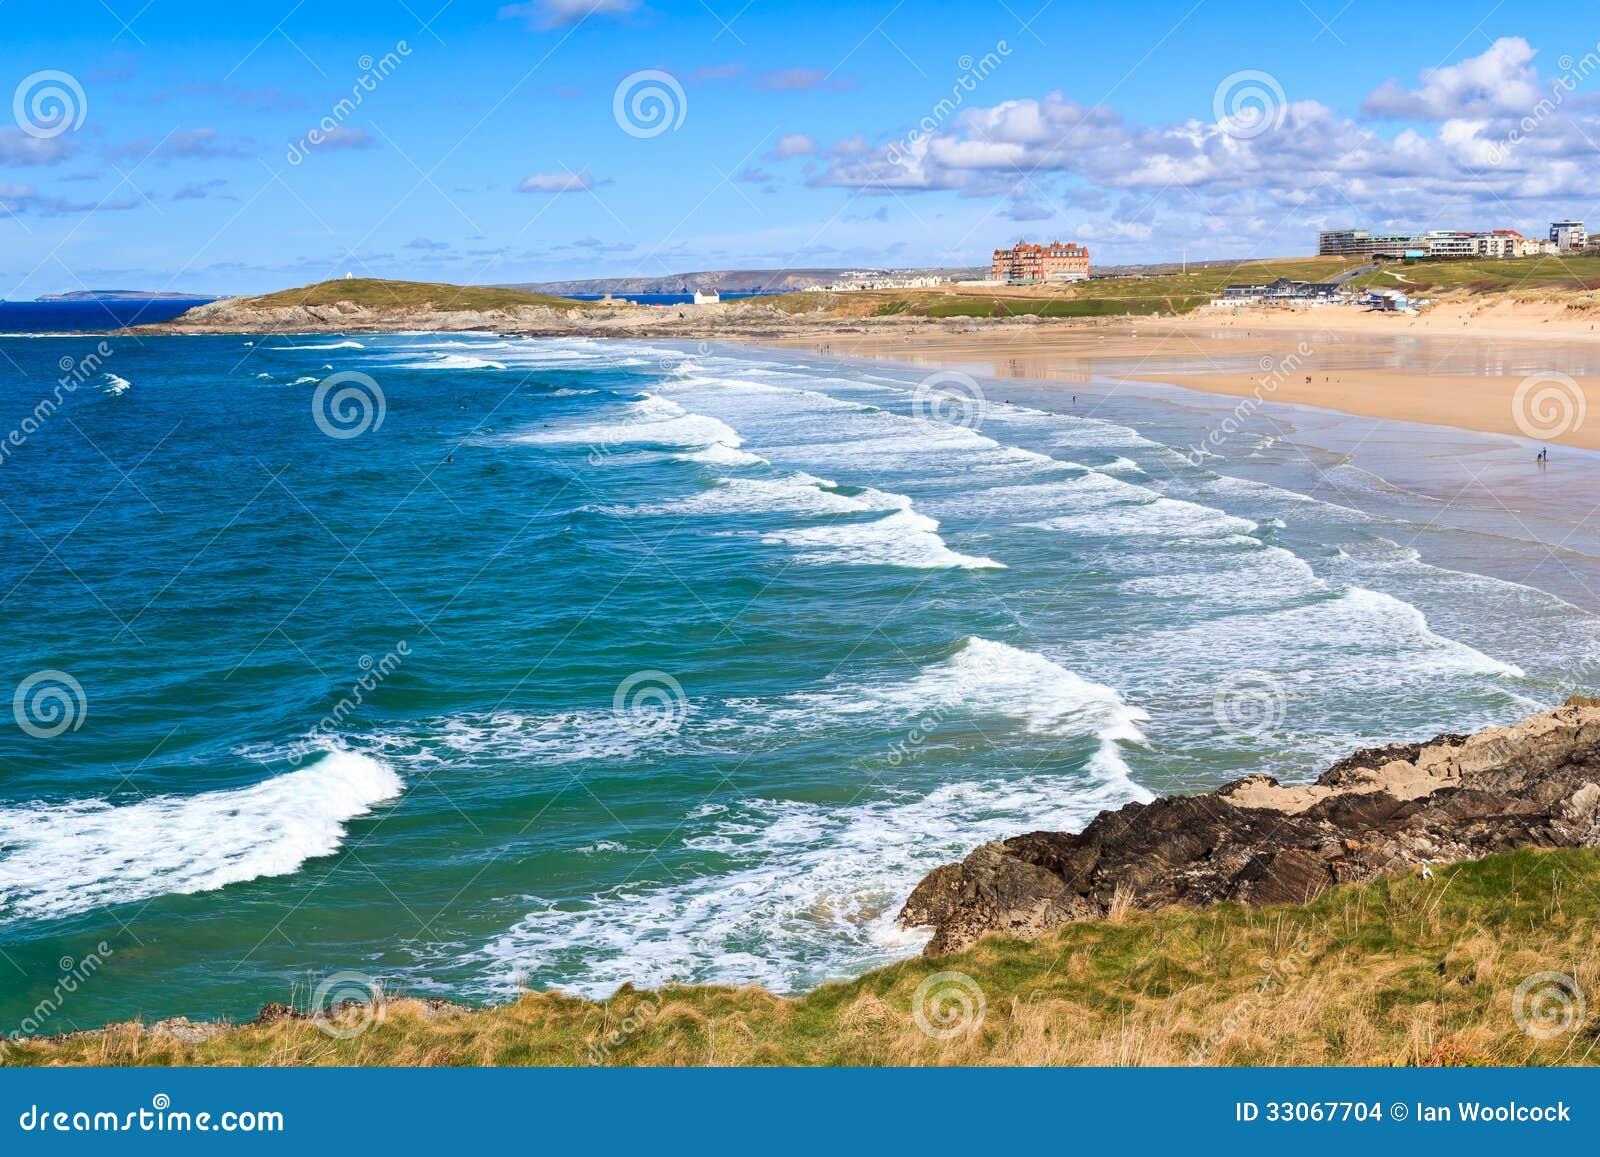 Newquay Cornwall England Stock Images - Image: 33067704